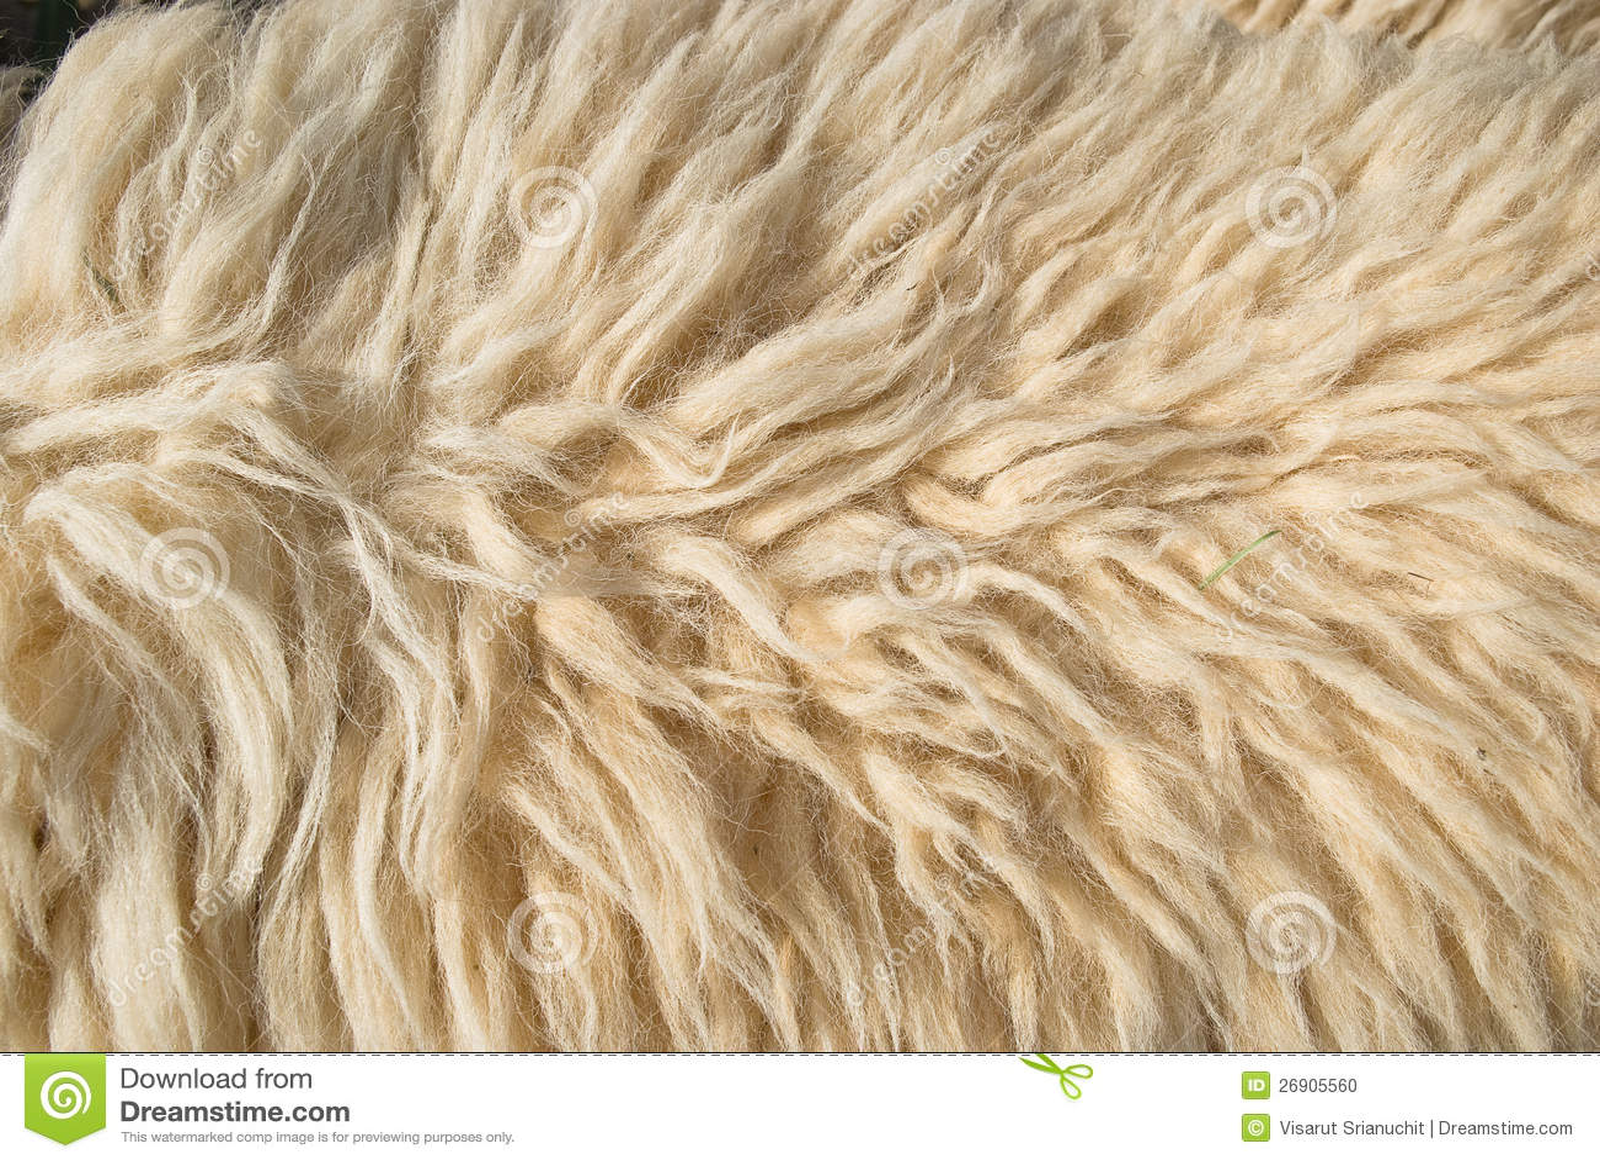 White Sheep Wool Stock Photo Image 26905560